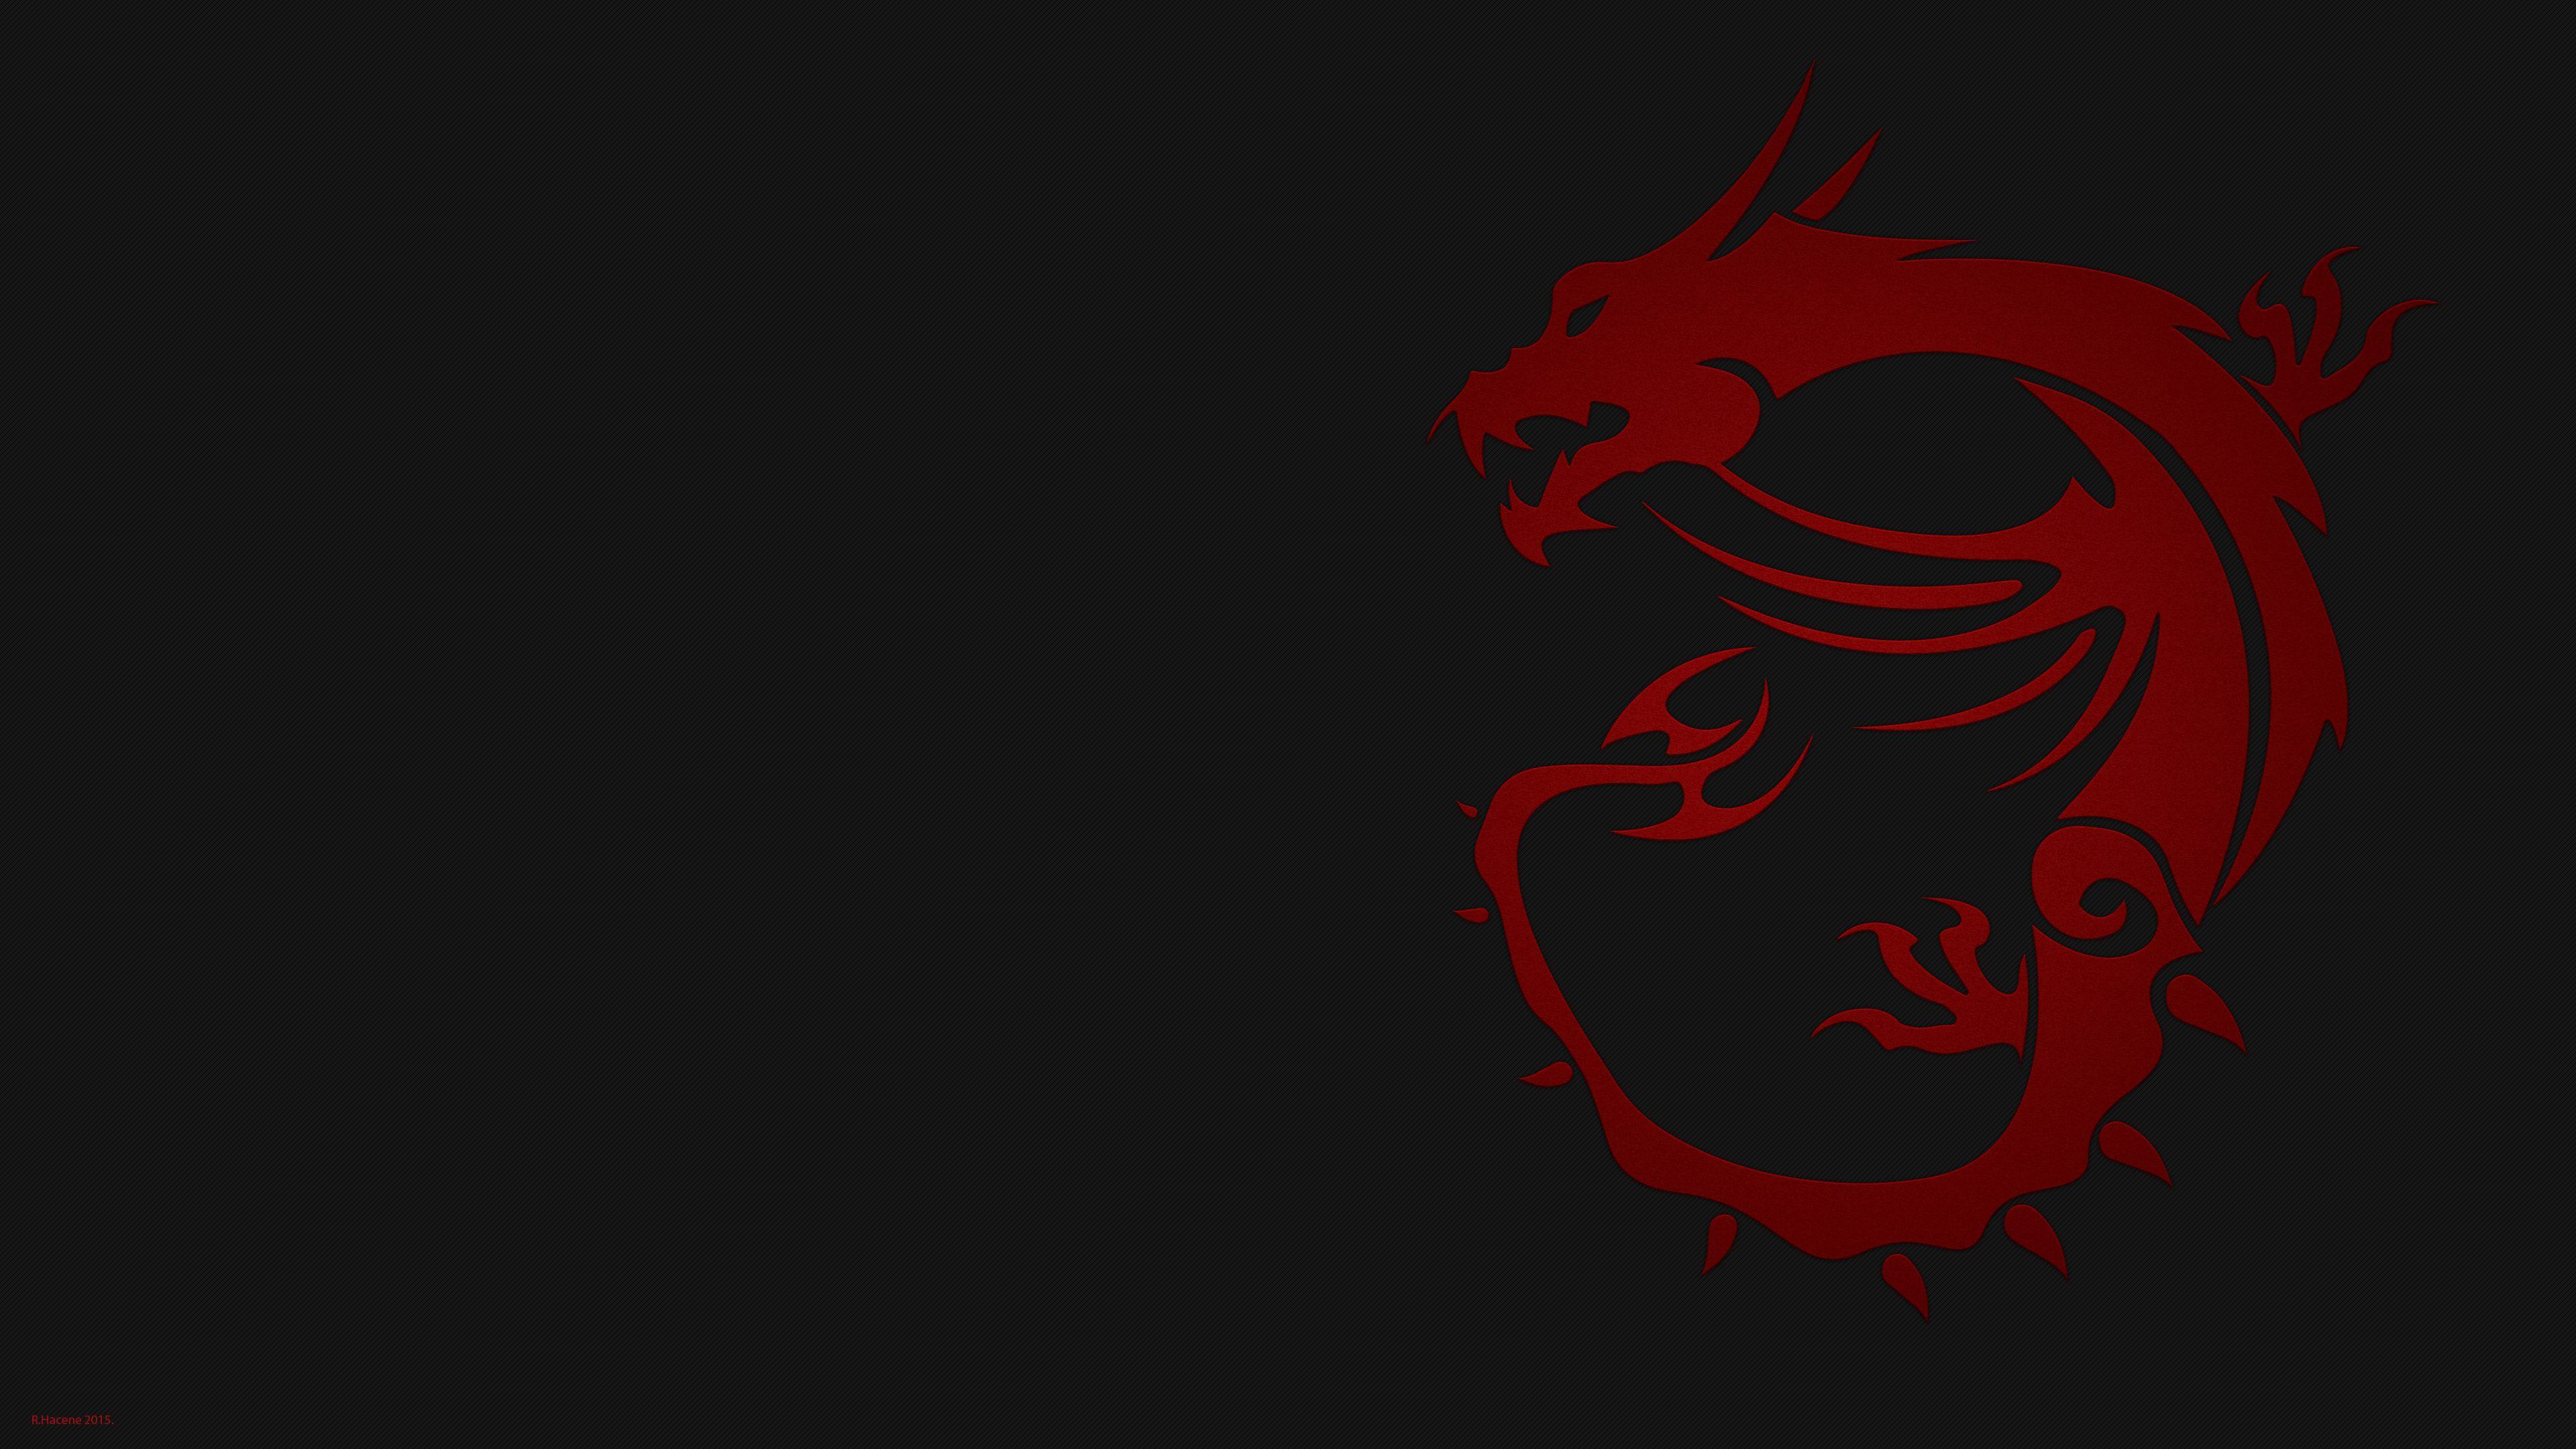 Red dragon MSI wallpaper